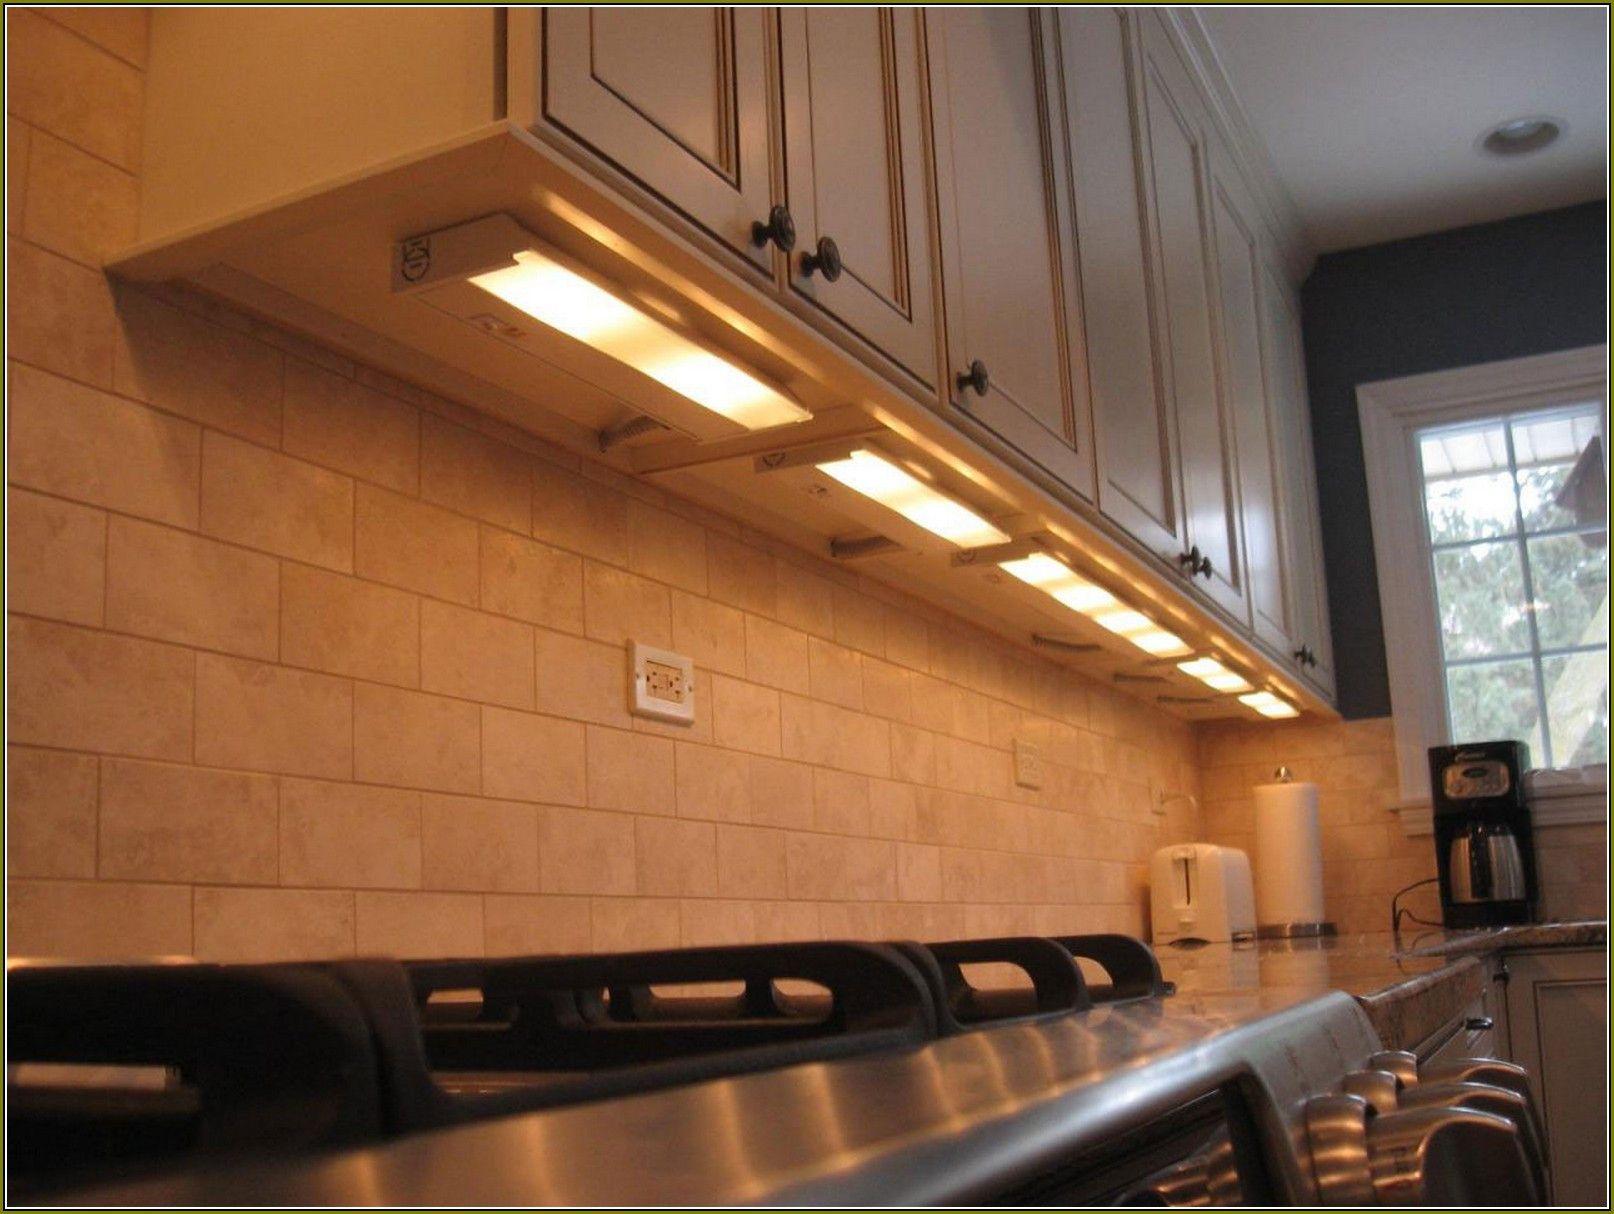 2018 Warm Led Under Cabinet Lighting Kitchen Cabinet Inserts